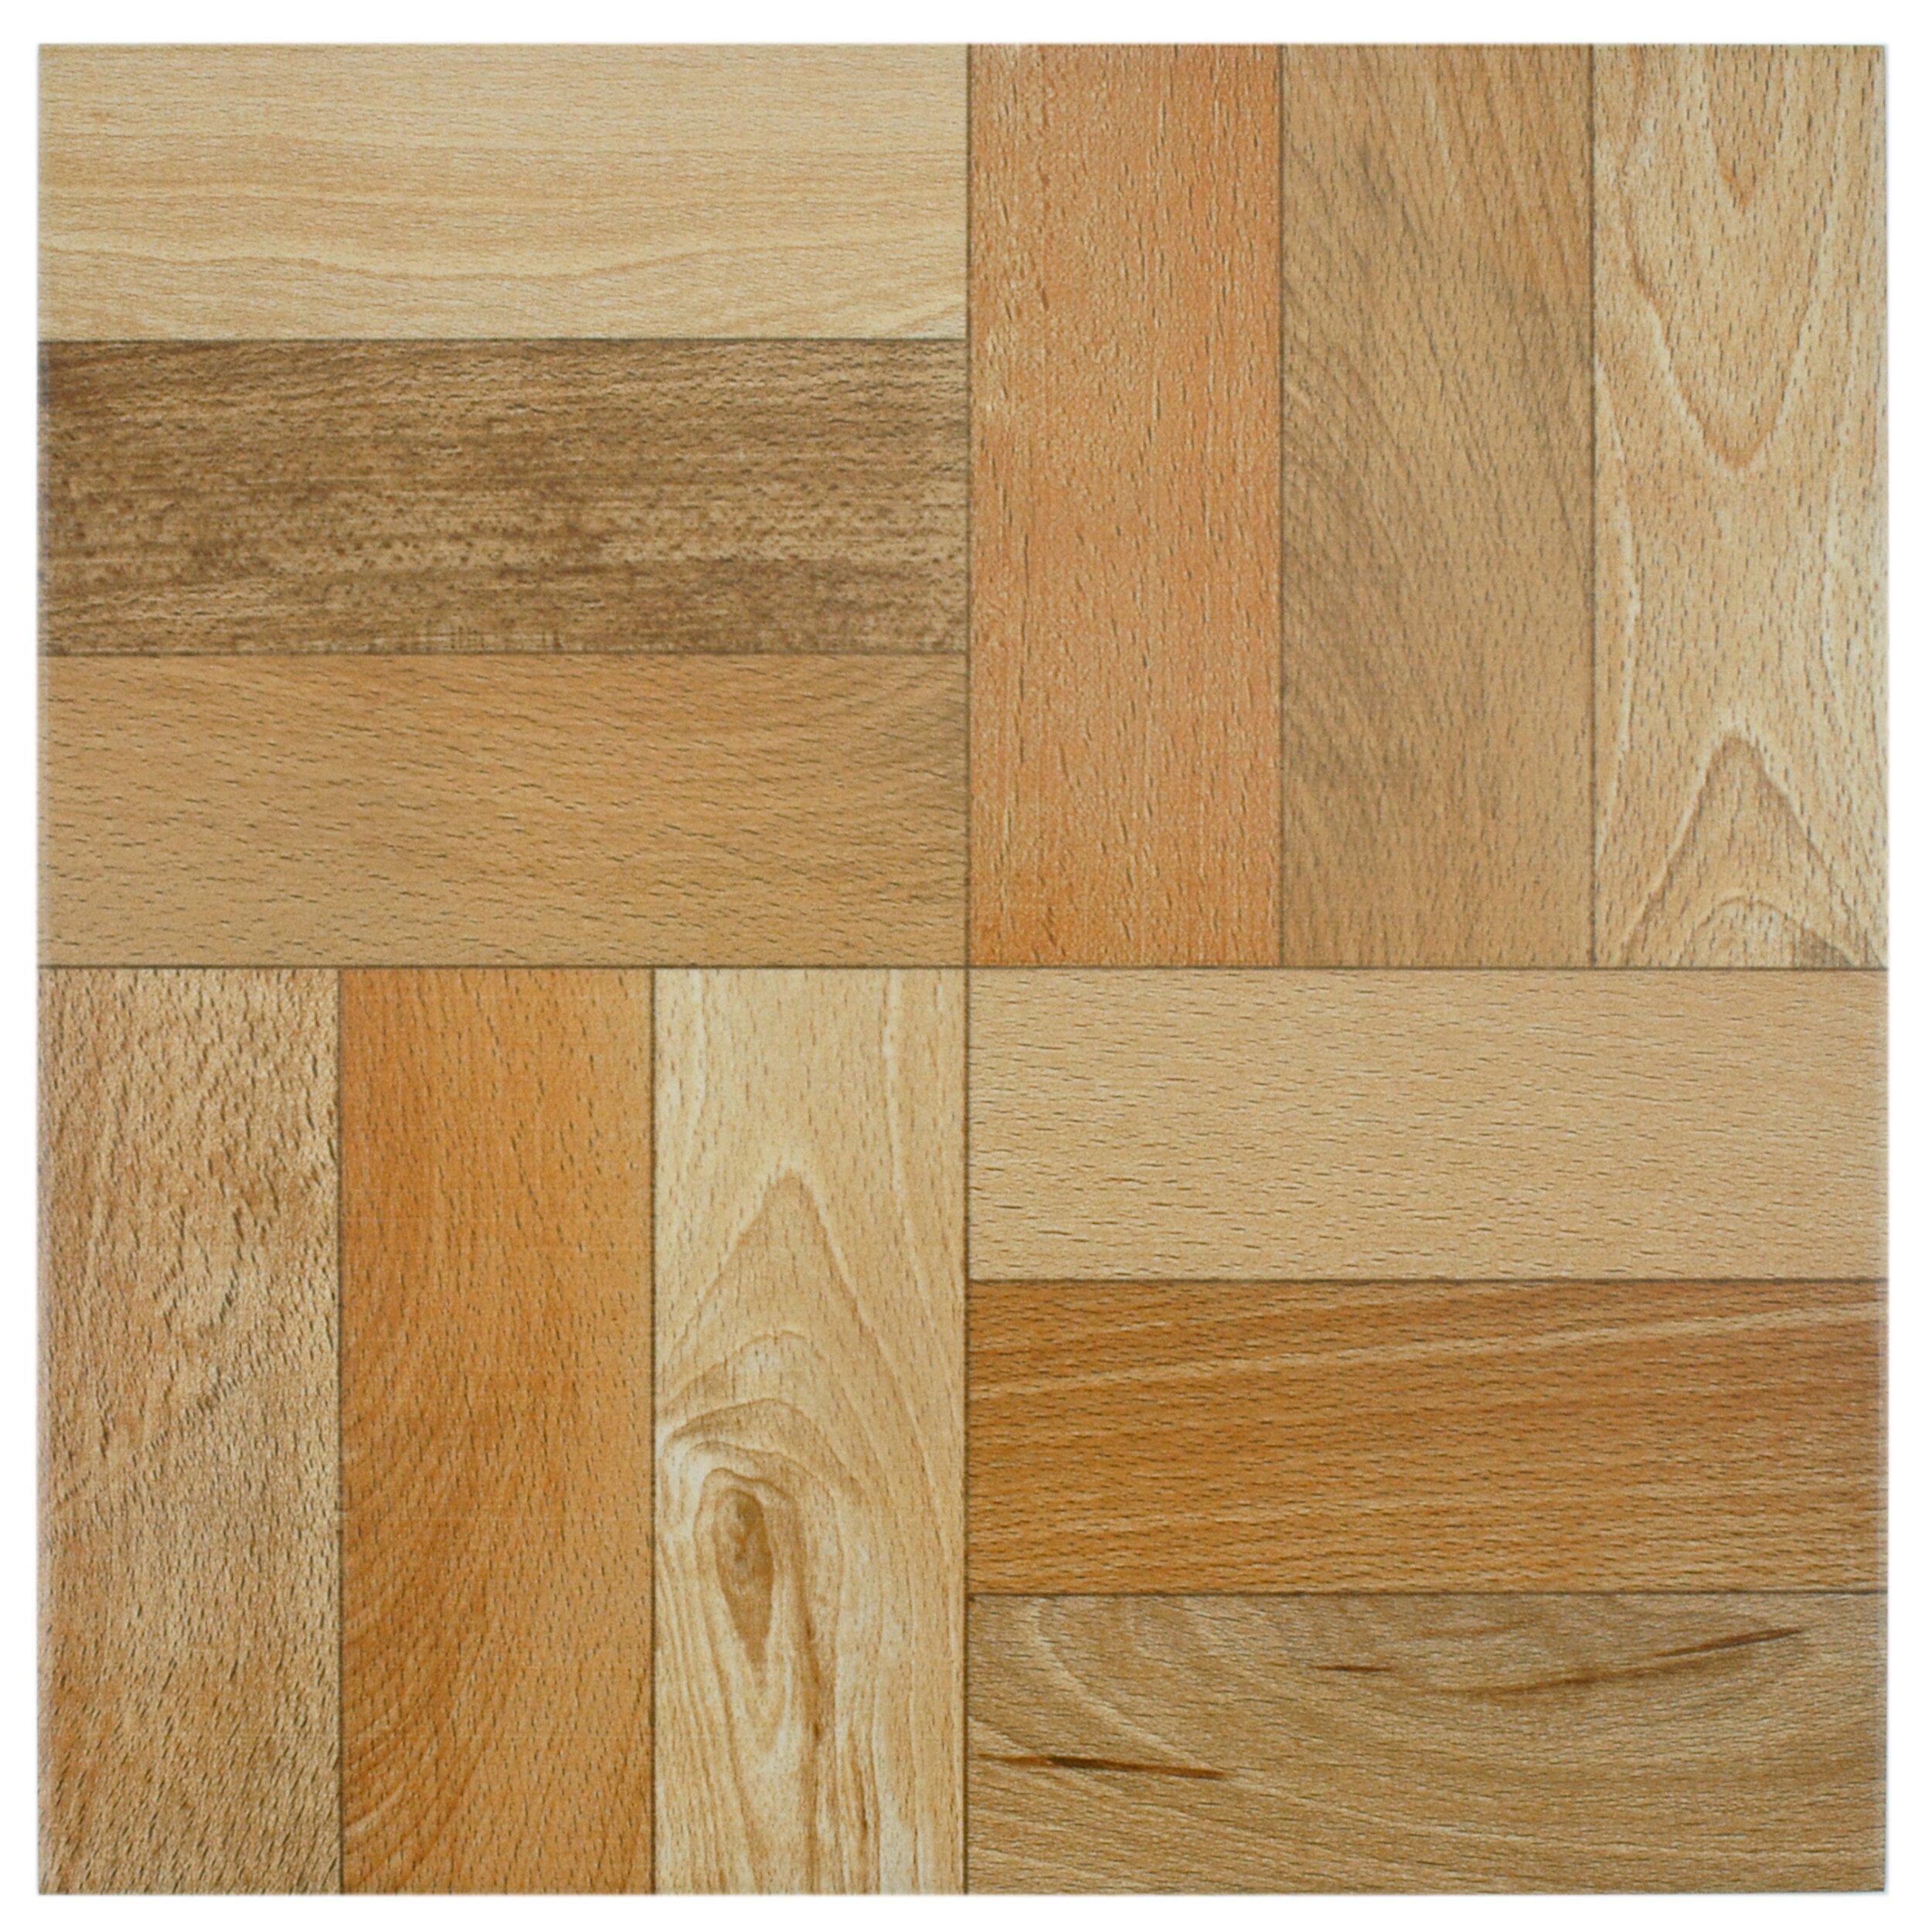 Elitetile cobi 12 5 x 12 5 ceramic wood tile in cerezo for 12 x 12 wood floor tiles